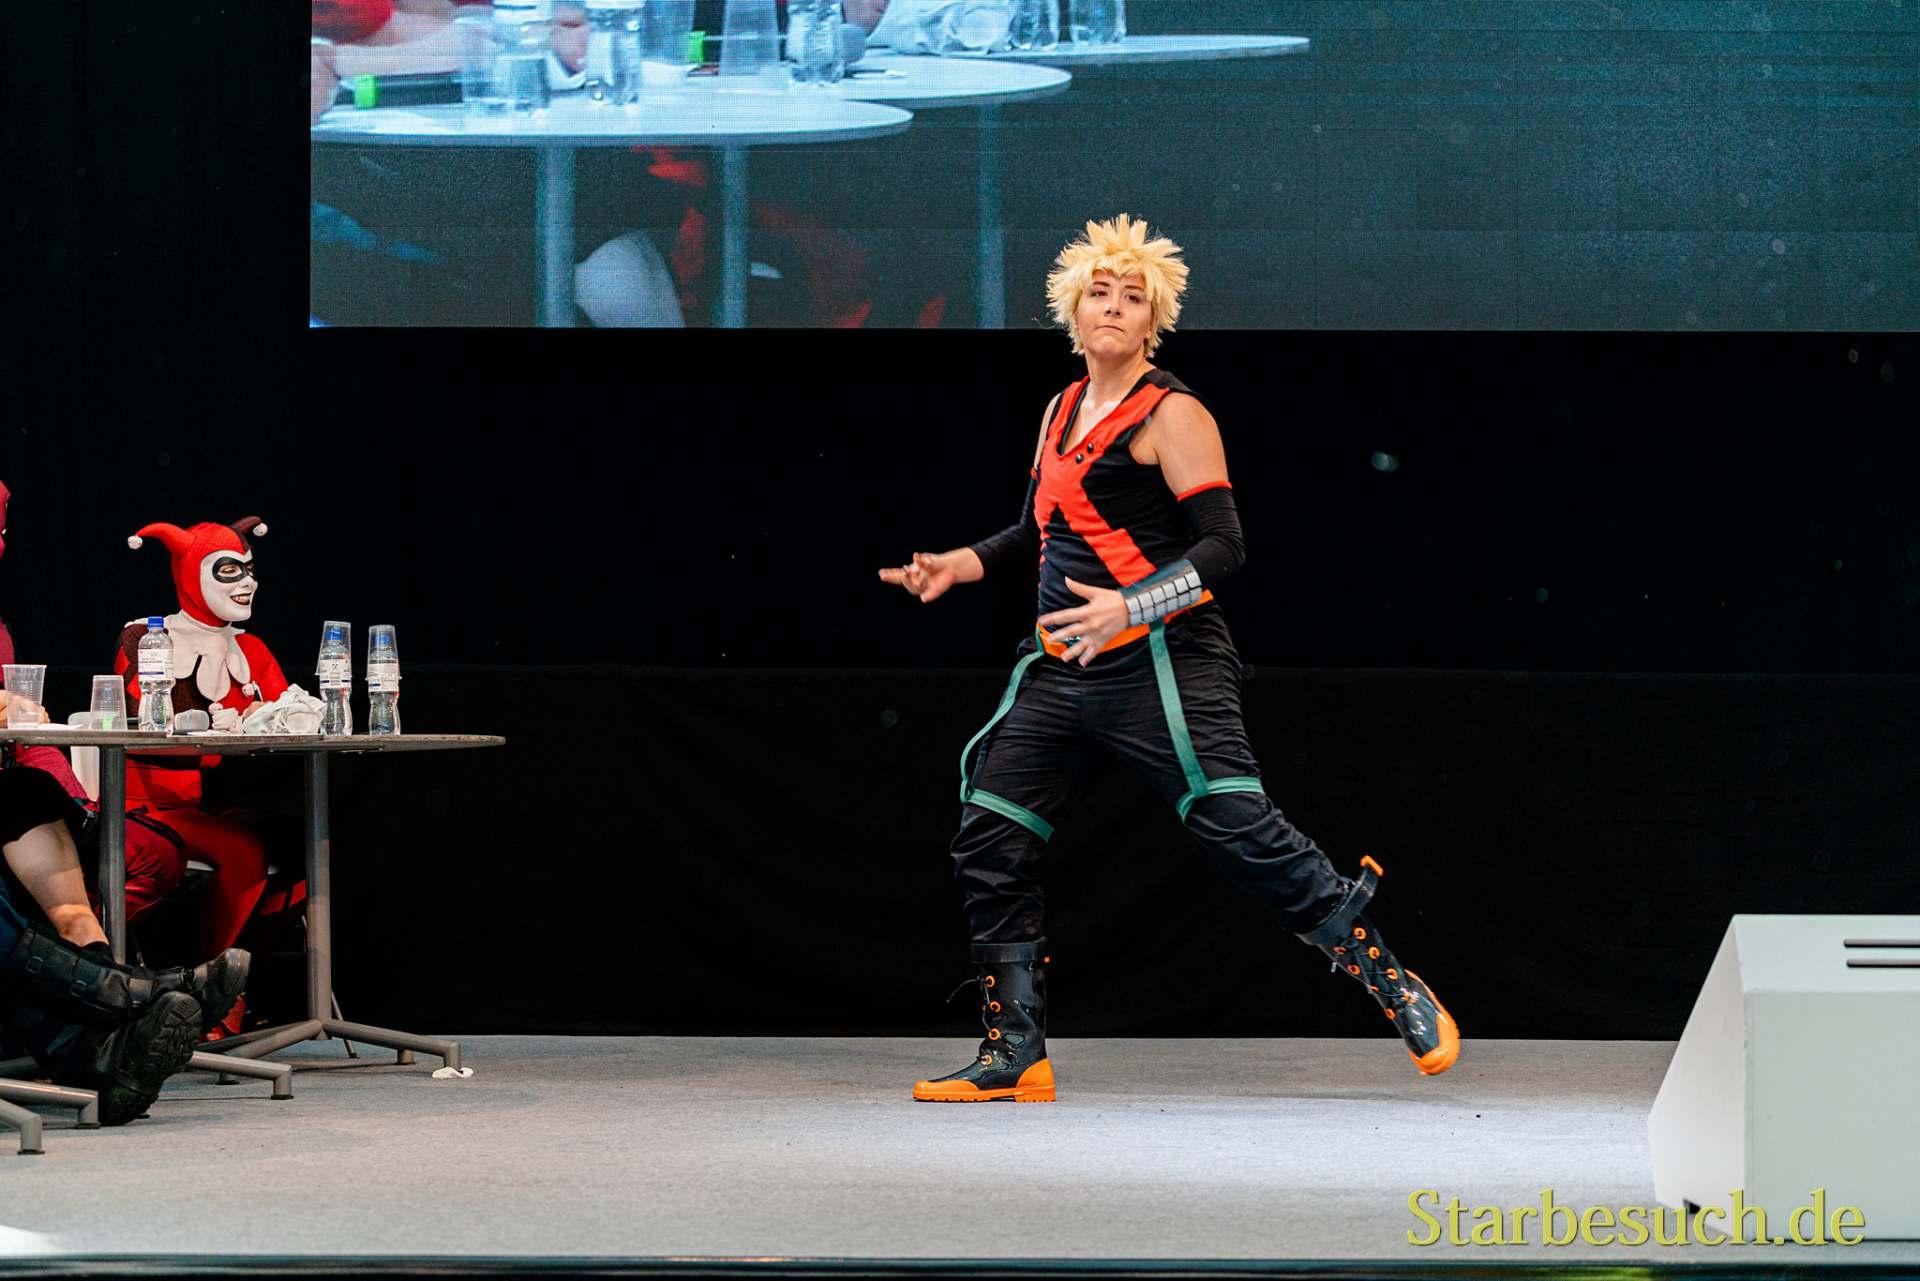 Cosplay Contest #30: Sarusaru Cos as Katsuki Bakugou from My Hero Academia